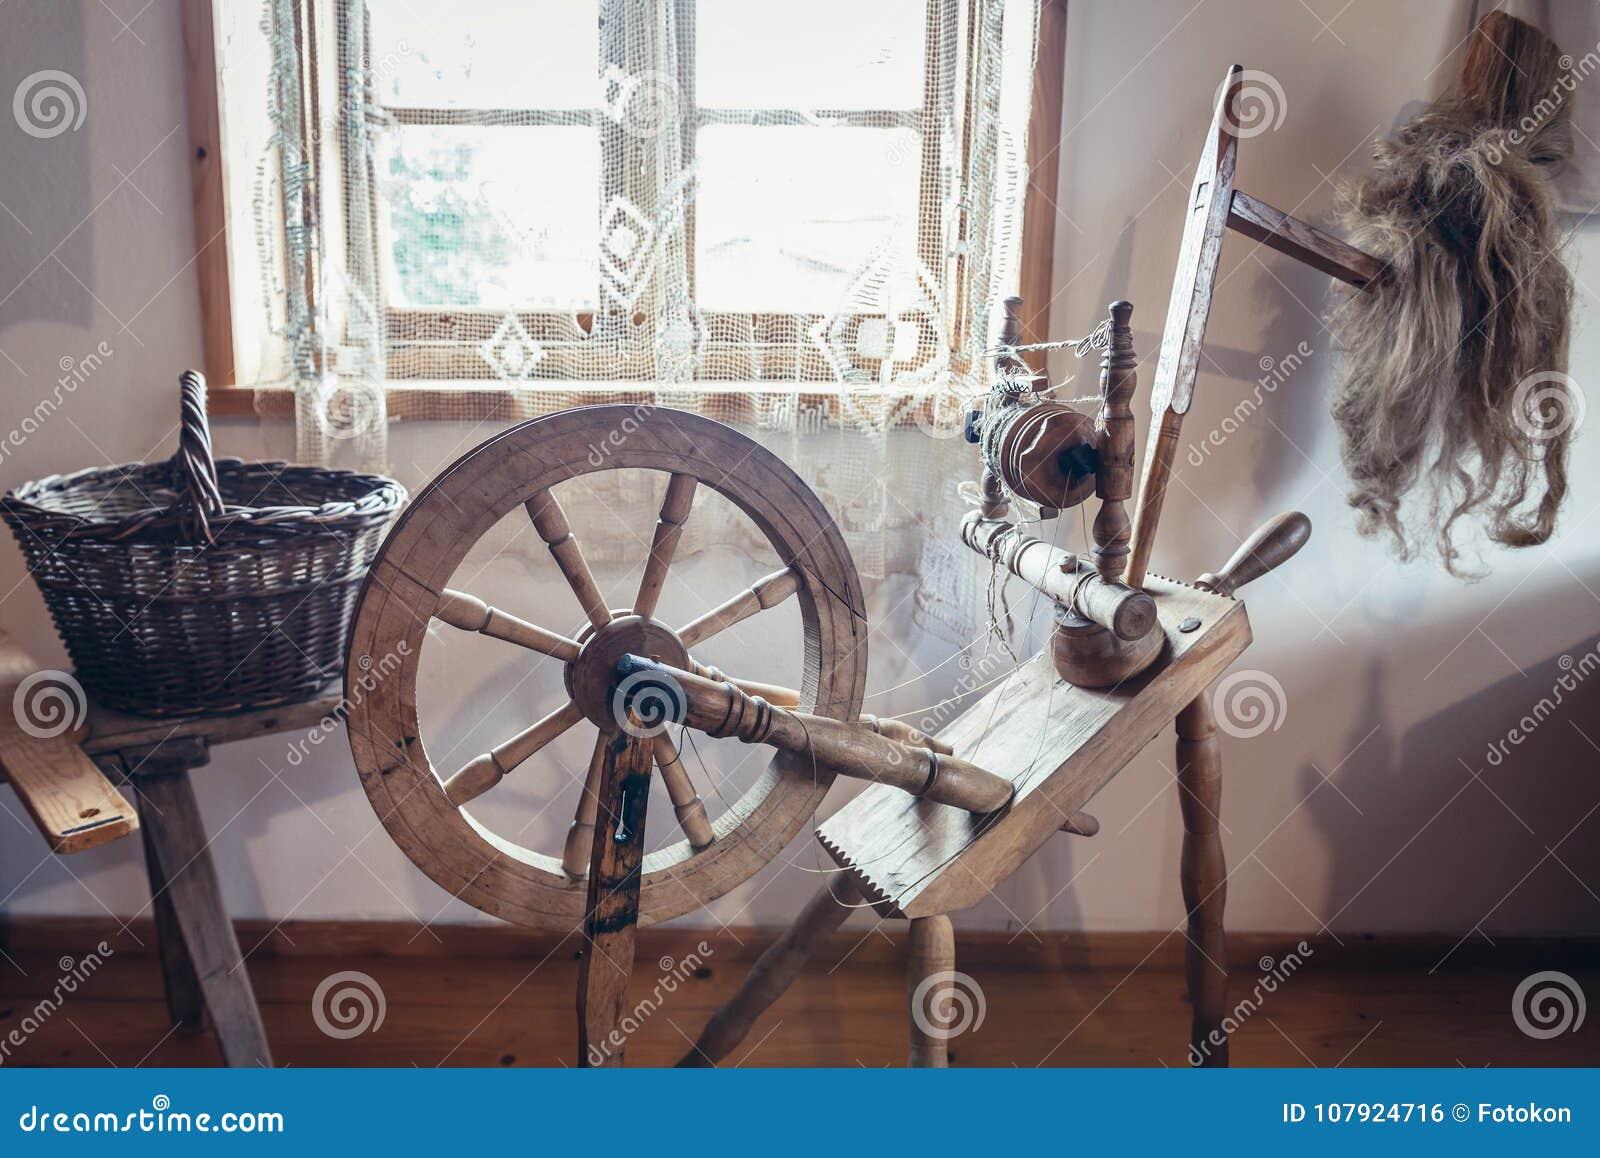 Old Spinning Wheel Stock Photo Image Of Masuria Museum 107924716